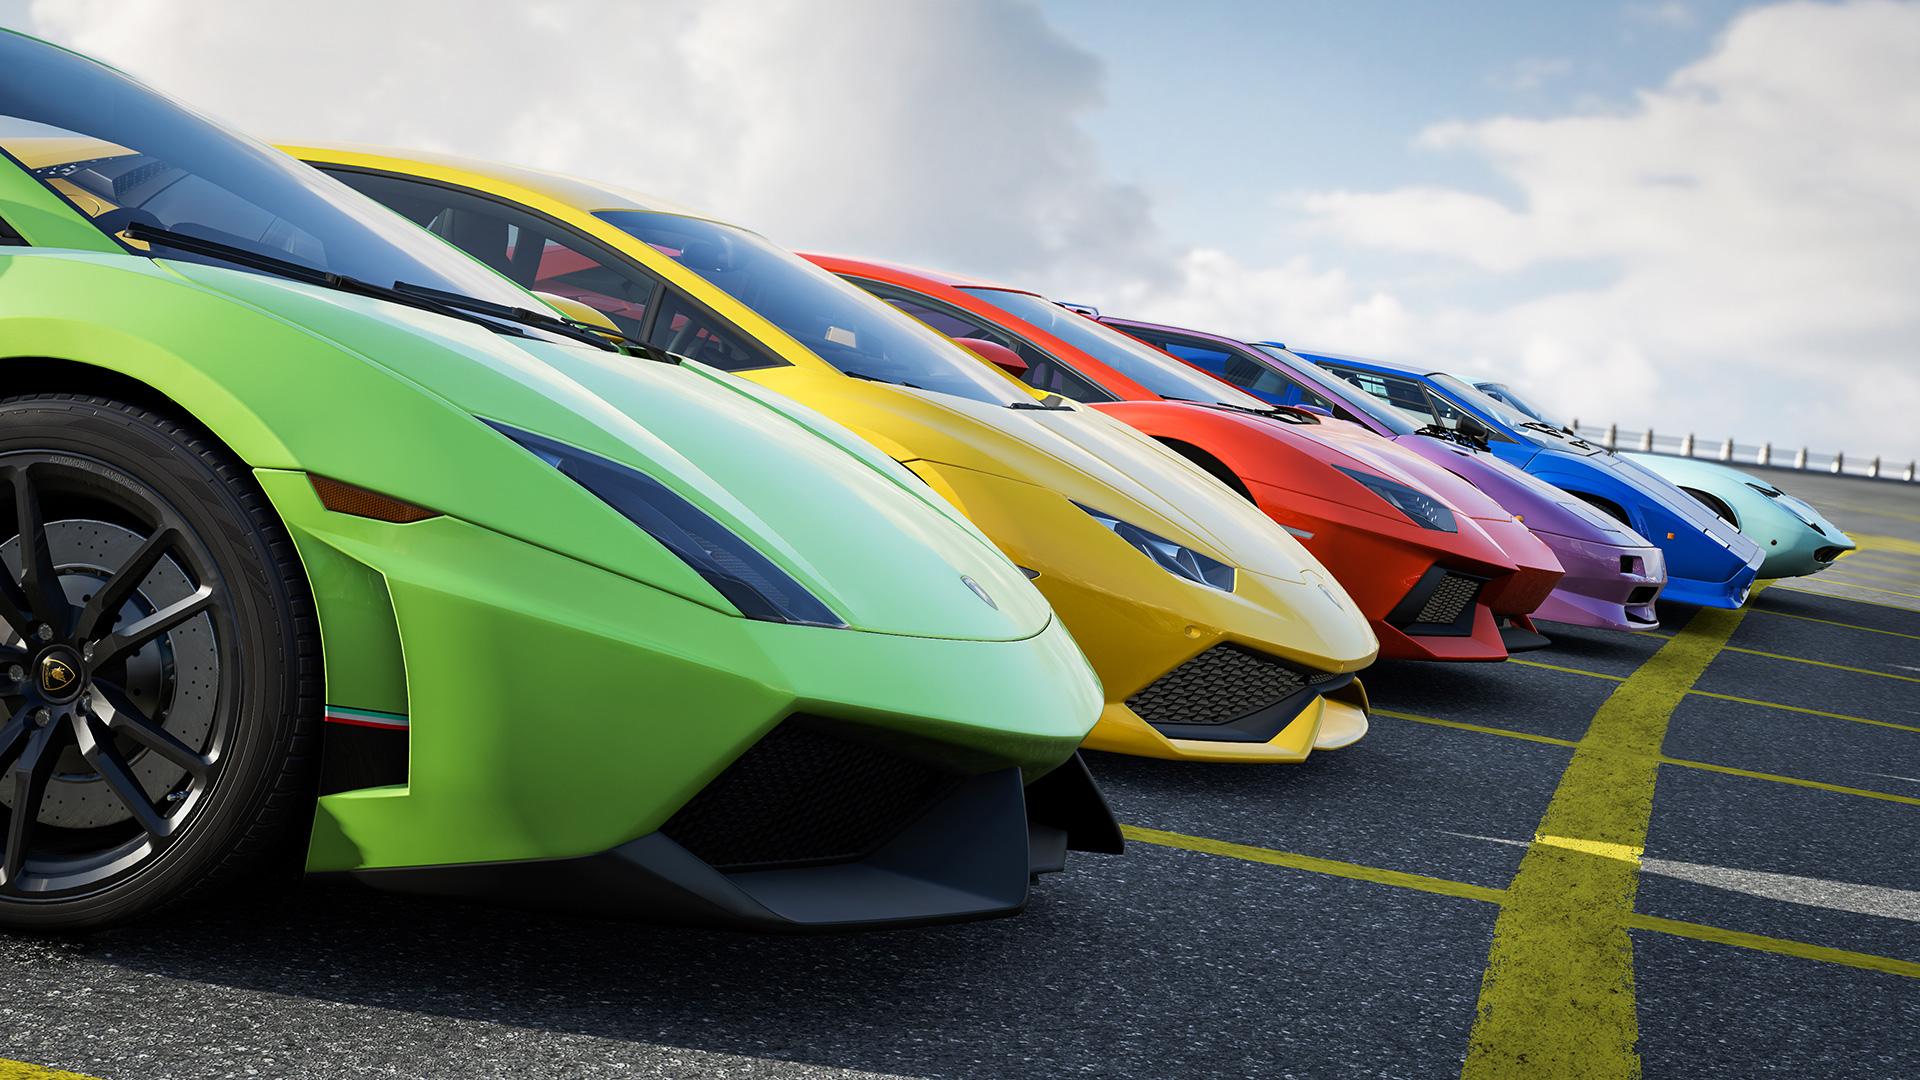 Lamborghinis HD Wallpaper